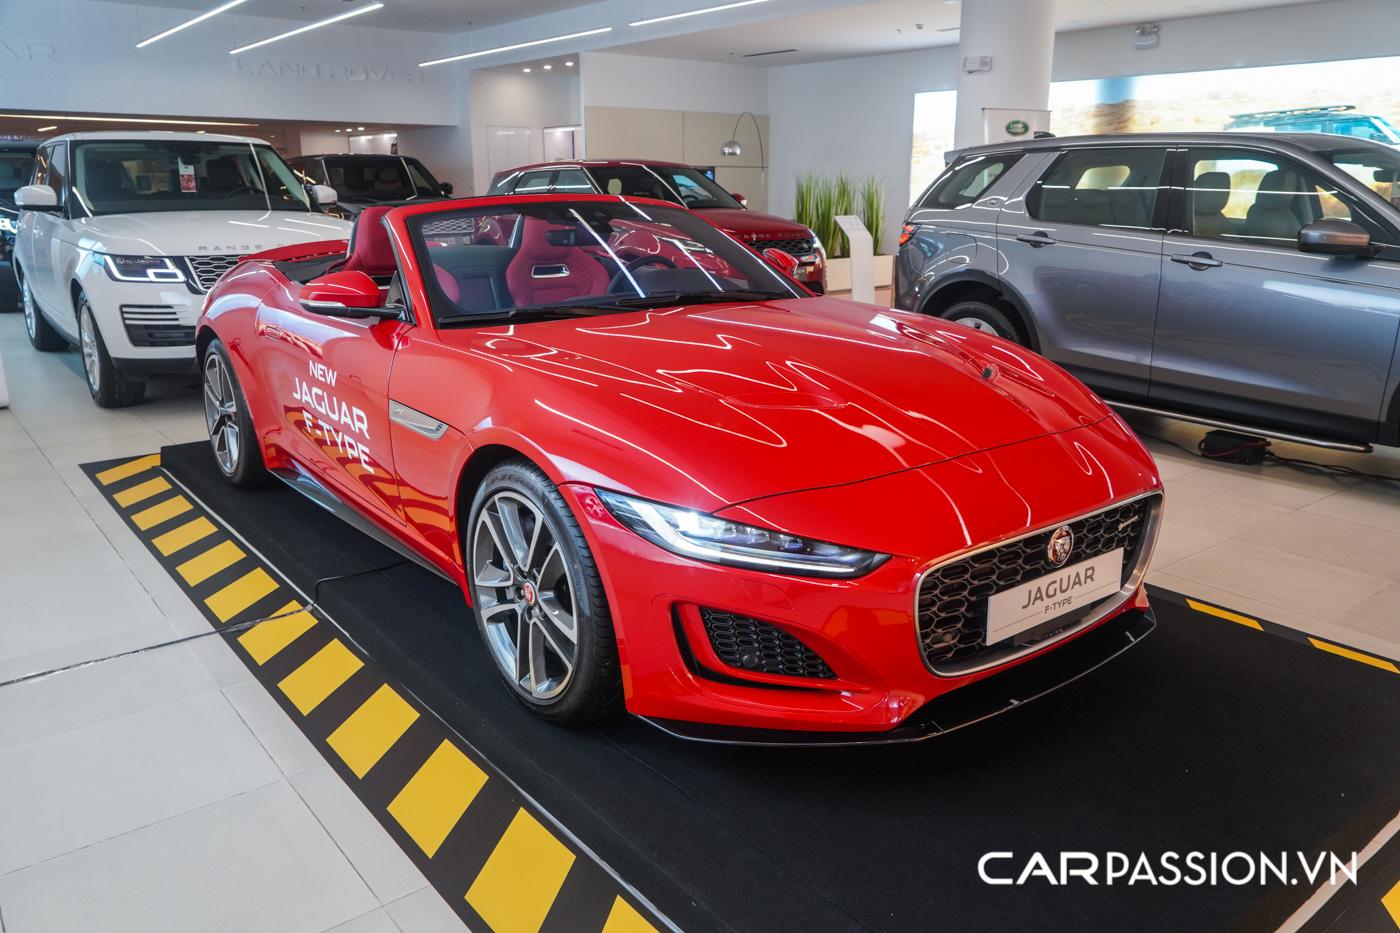 bảng-giá-xe-jaguar-2.jpg